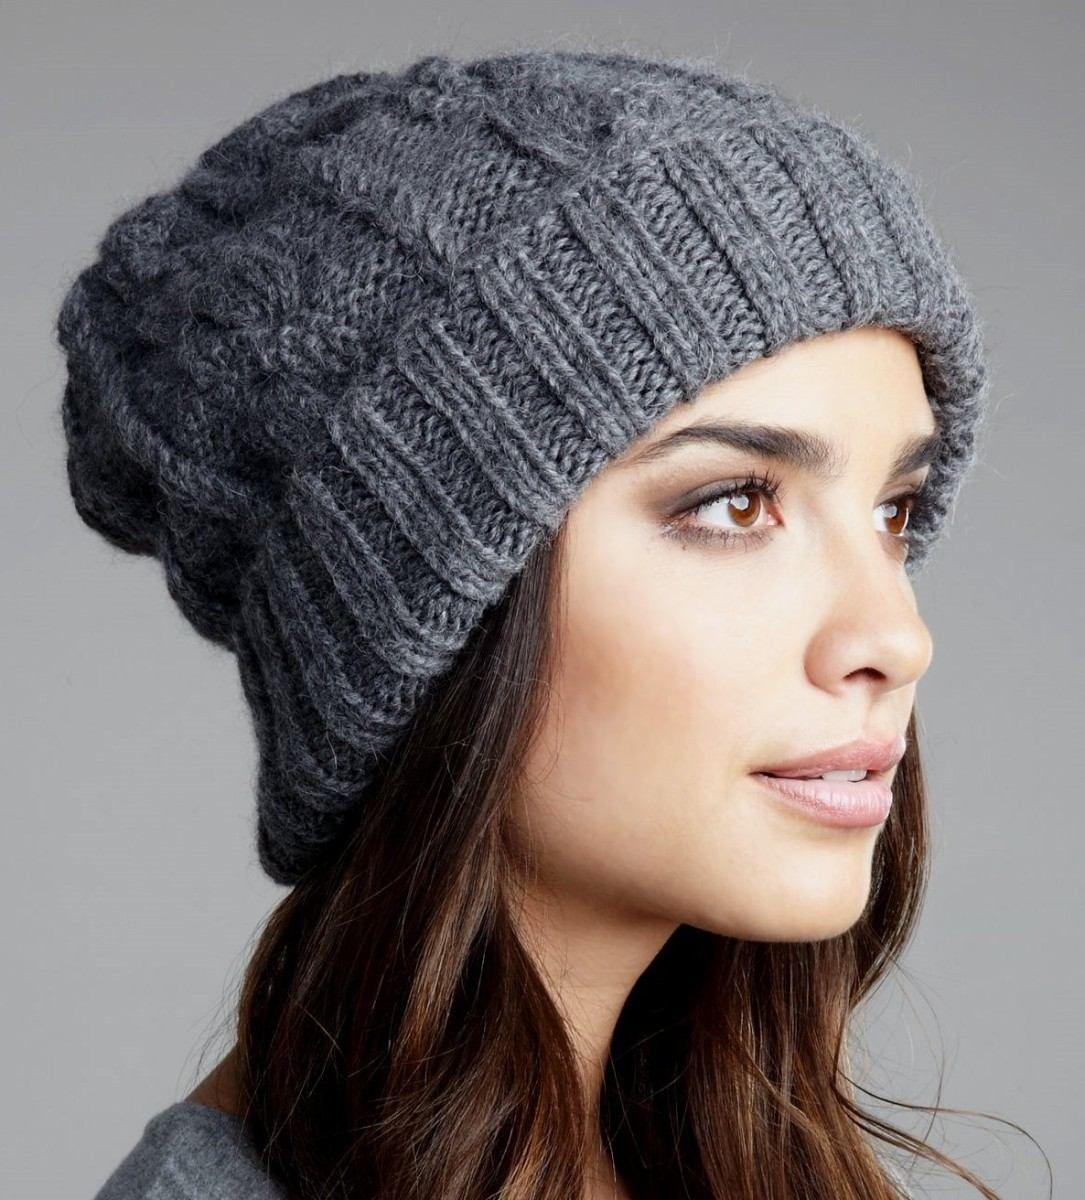 hermoso gorro tejido con lana 100% suave antialergica alpaca ... 0adb54ea9ba